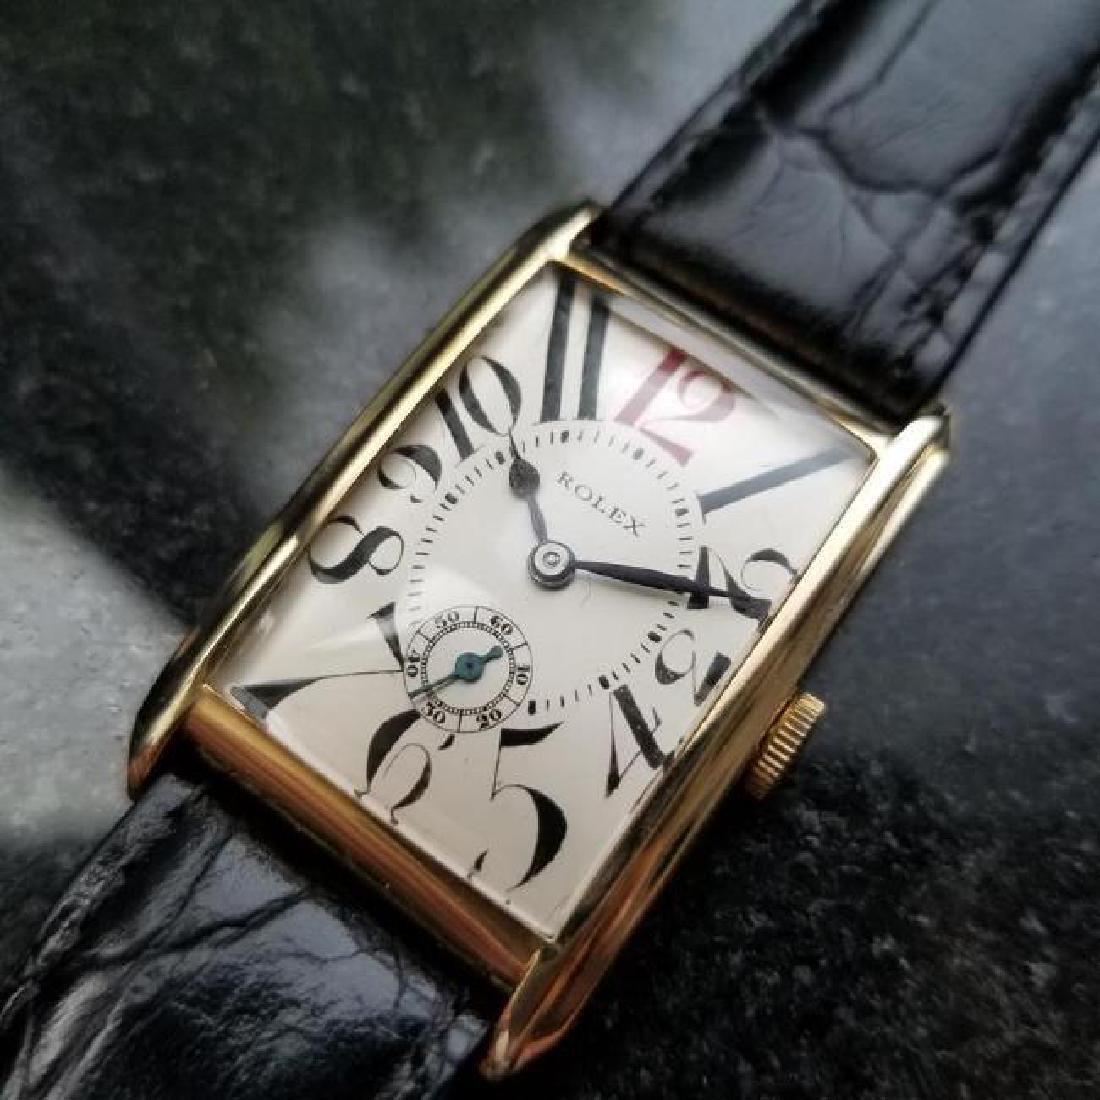 a9e03a32542 ROLEX Rare Men's 9ct Gold Art Deco Dress Watch, c.1920s - Dec 19, 2018 |  Jasper52 in NY